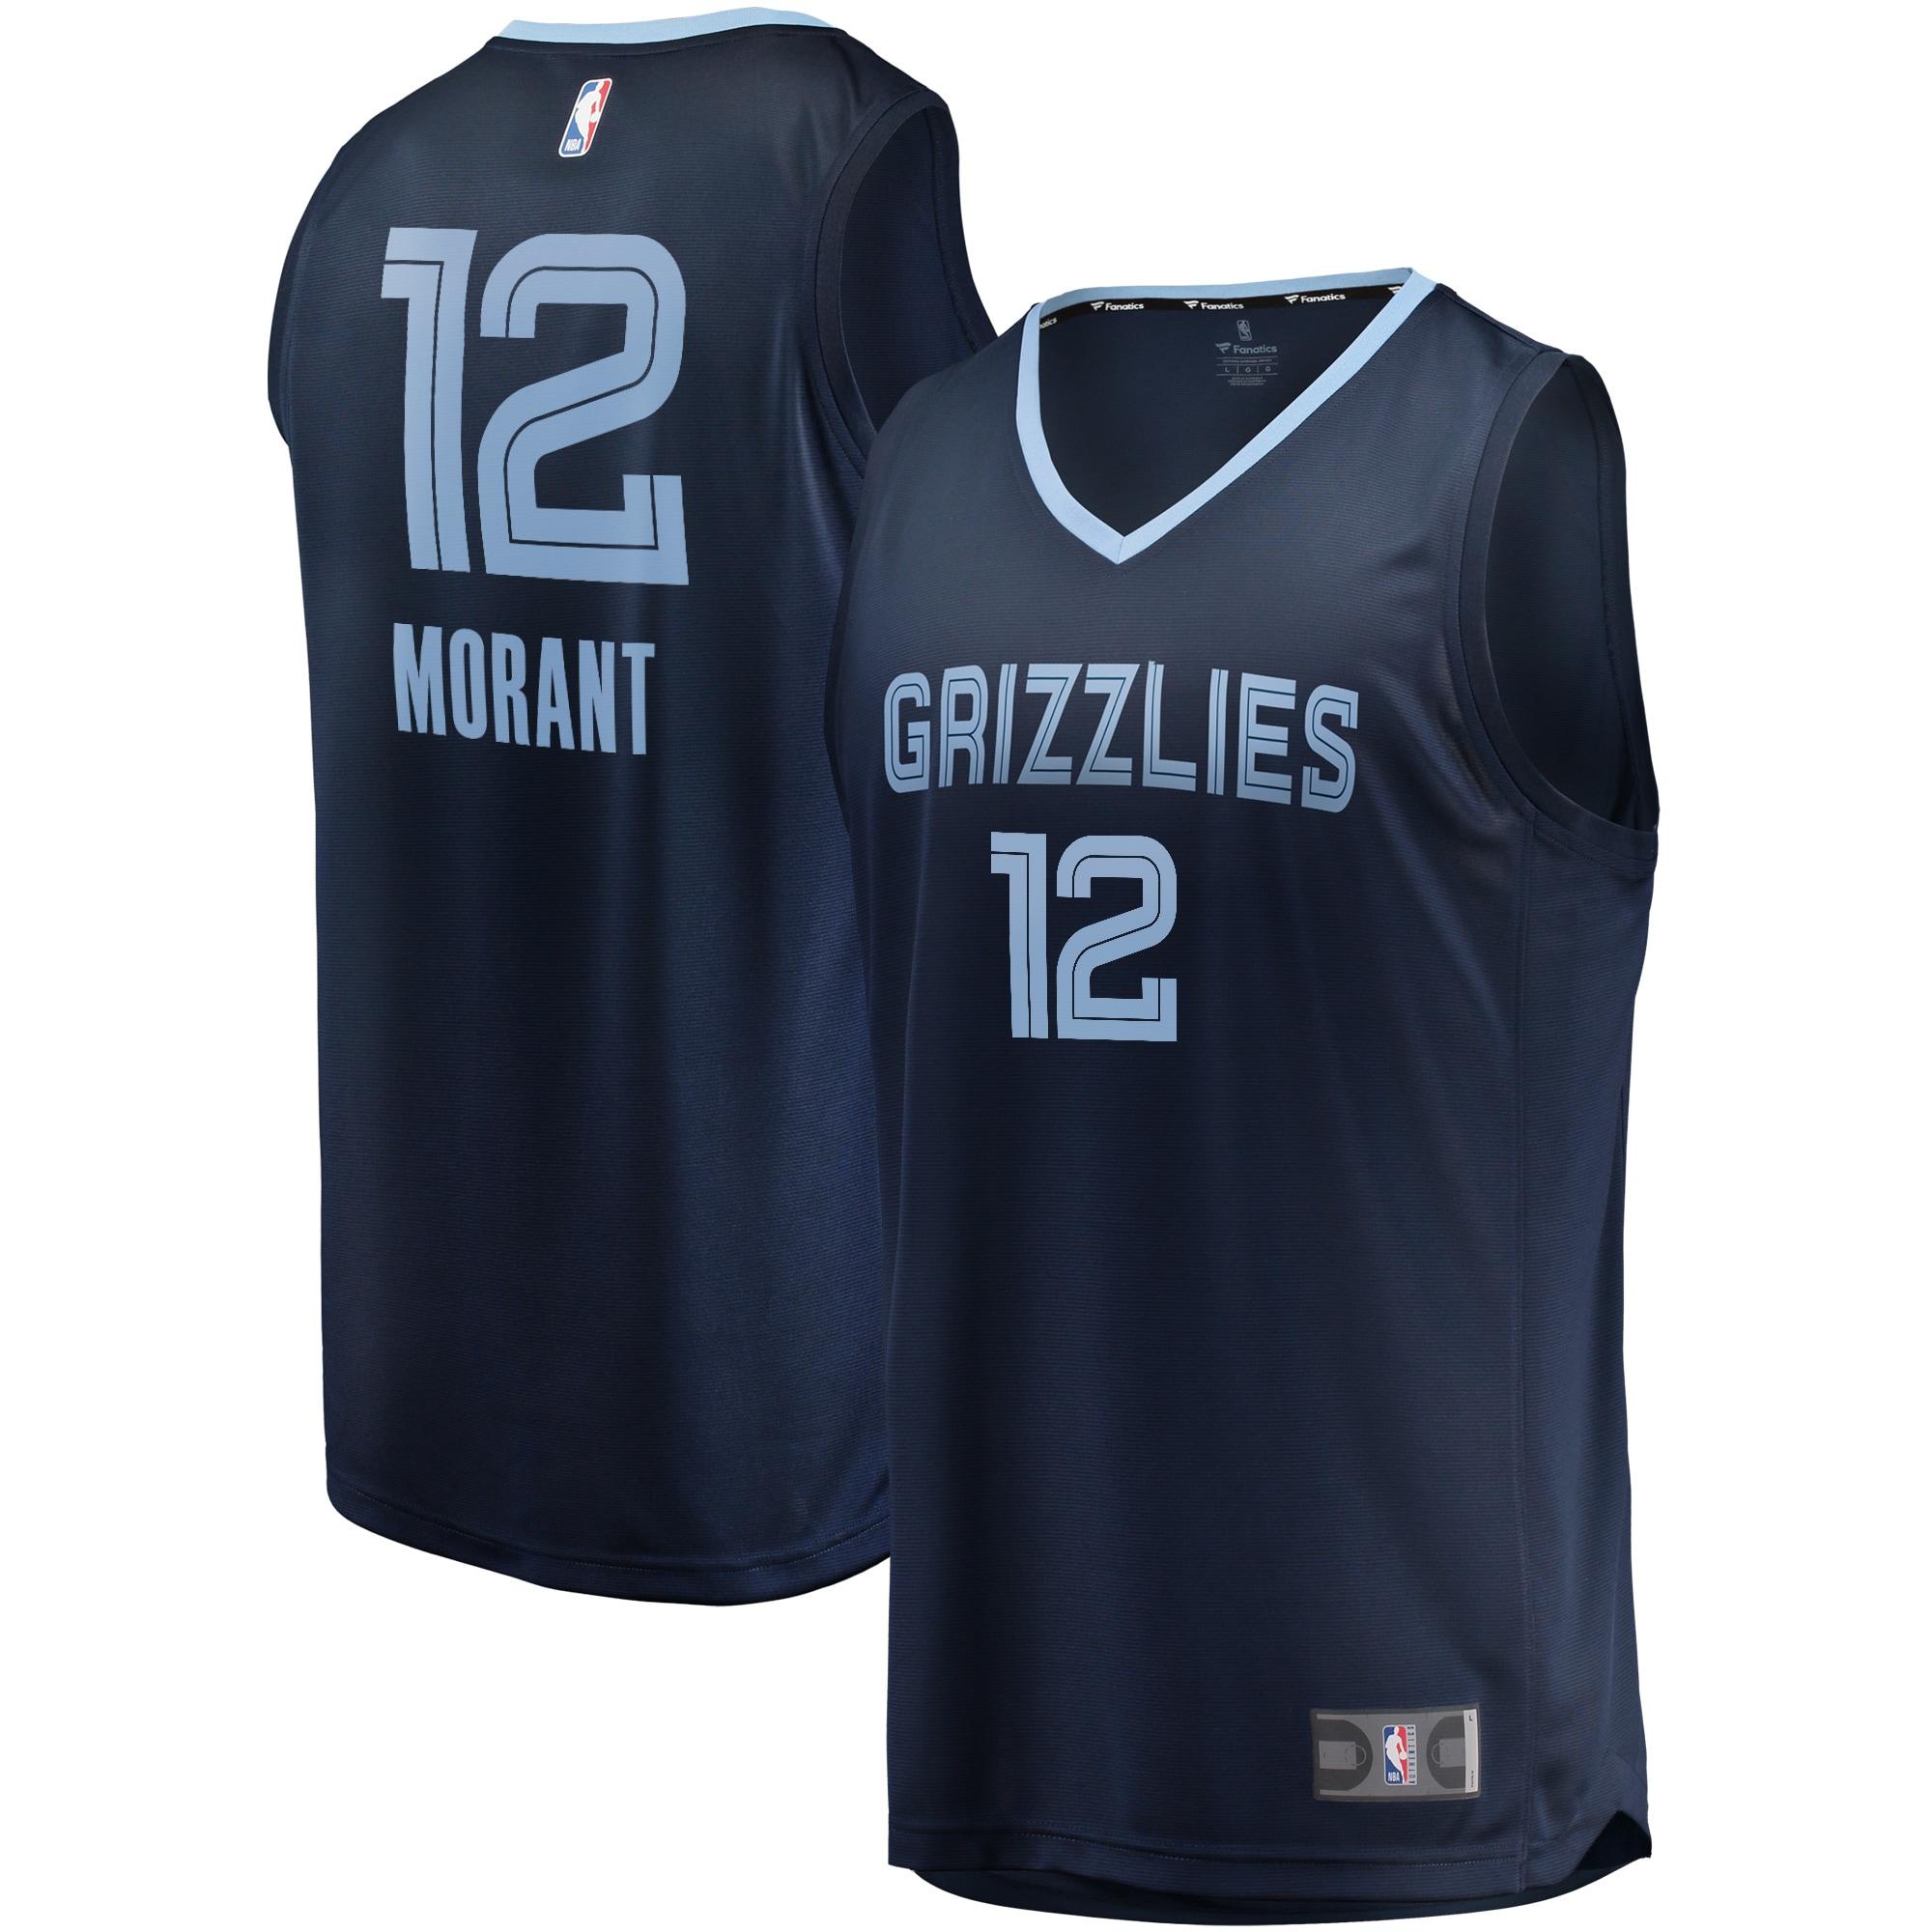 Ja Morant Memphis Grizzlies Fanatics Branded 2019 NBA Draft First Round Pick Fast Break Replica Jersey Navy - Icon Edition